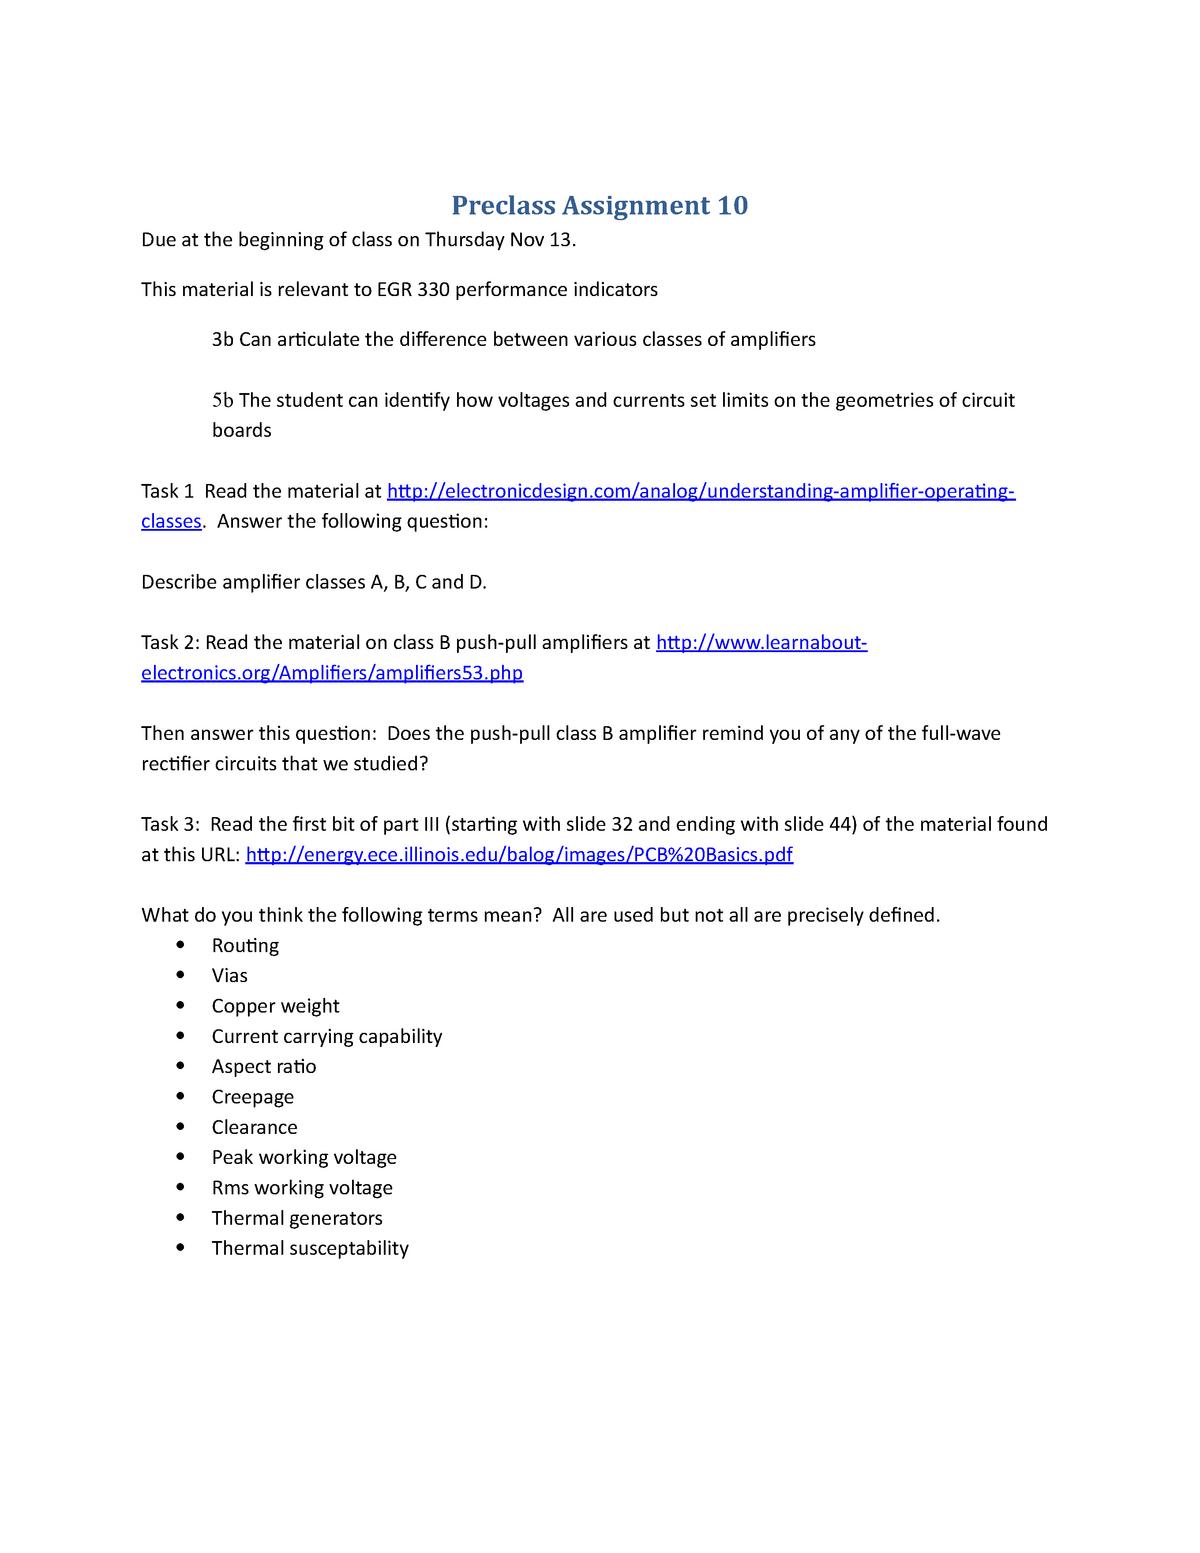 Preclass Assignment 10 - EGR 330: Design of Electrical